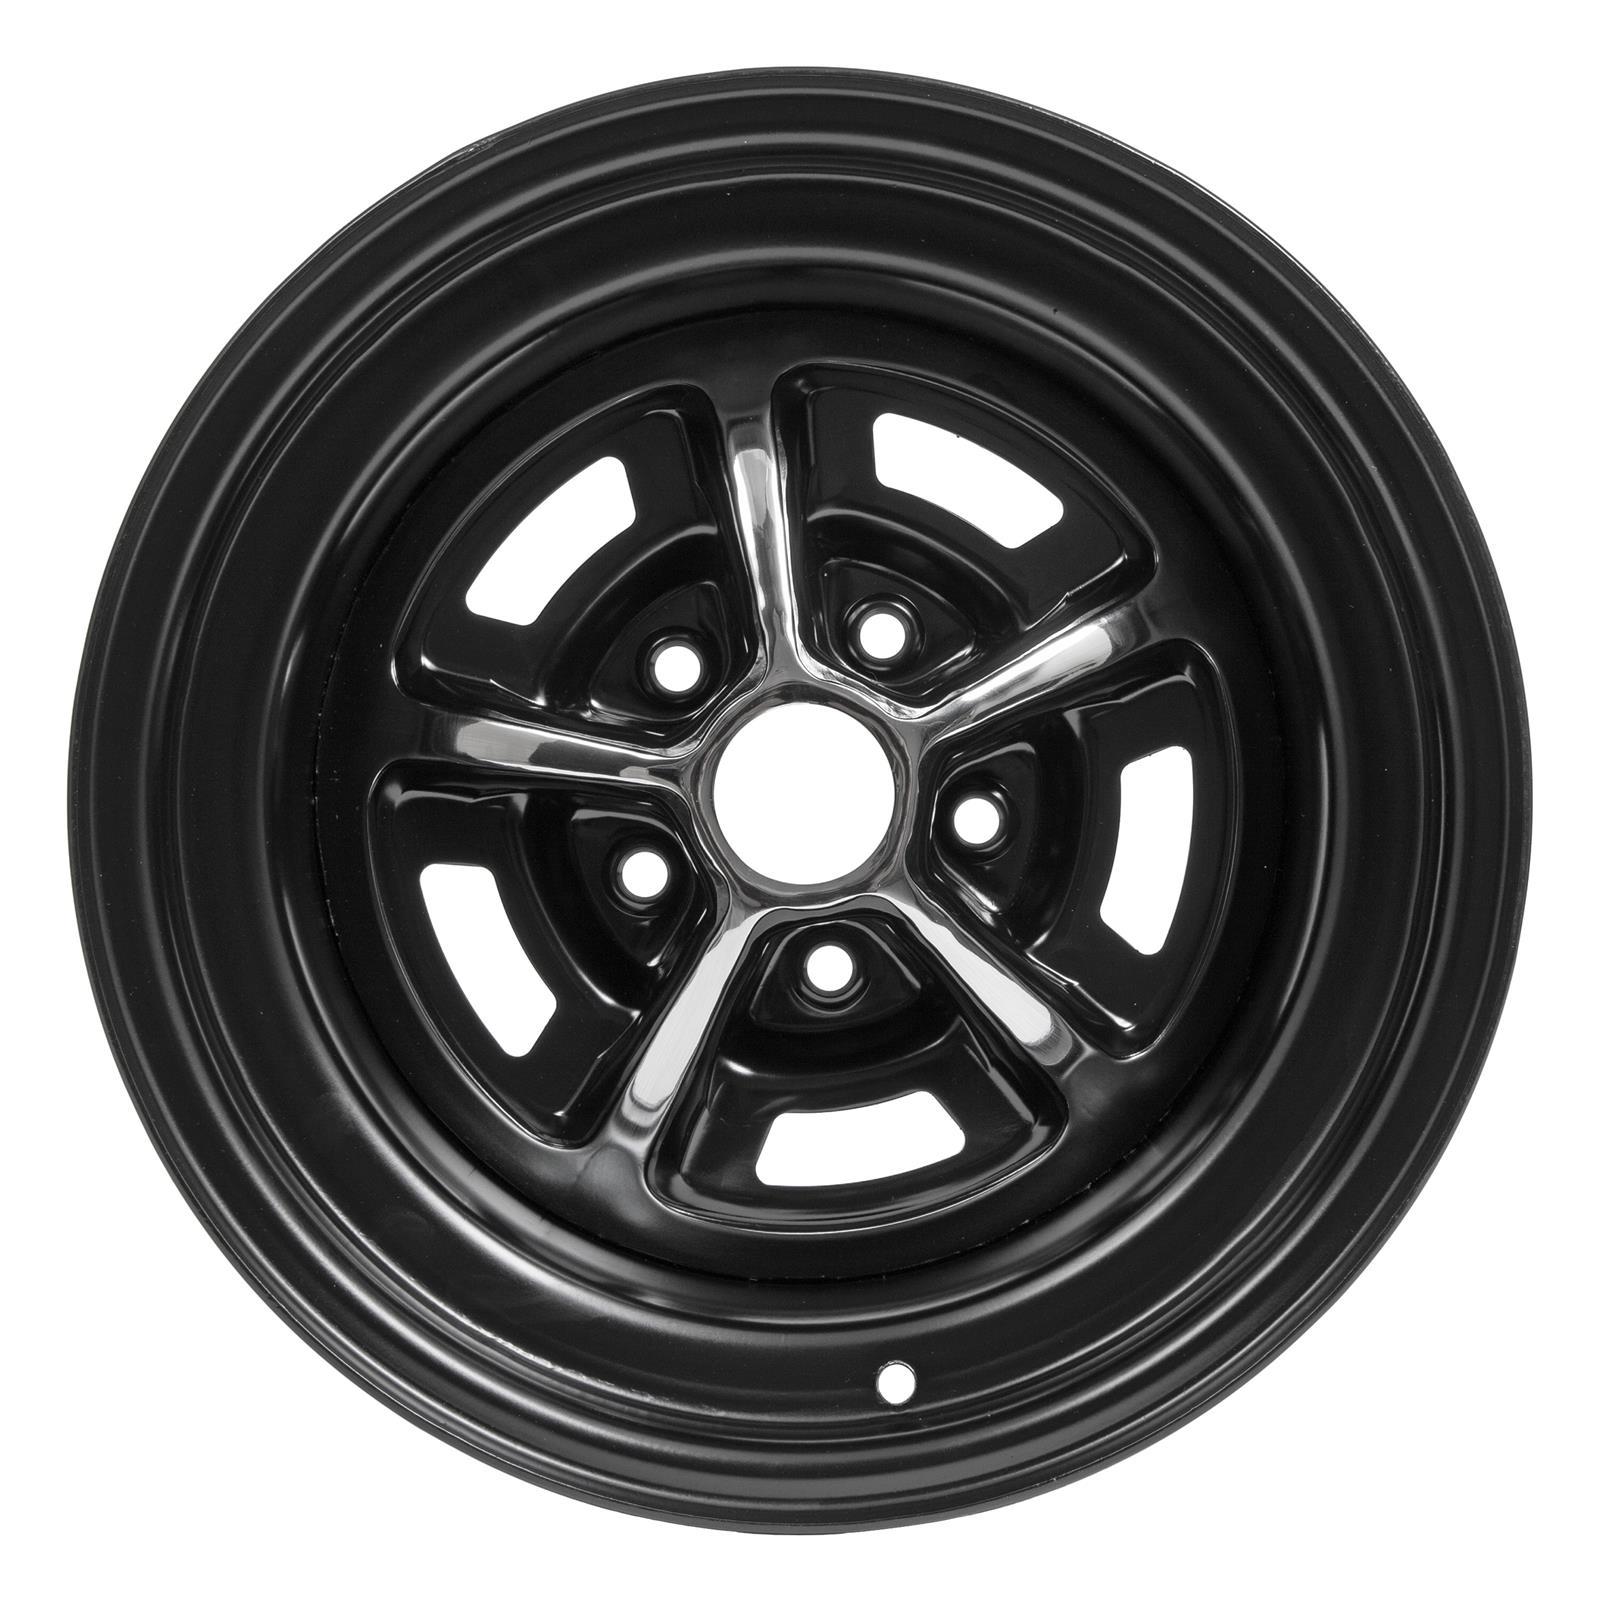 Magnum 500 Wheels >> Wheel Vintiques 84 Series Magnum 500 Road Wheels 84 5712044